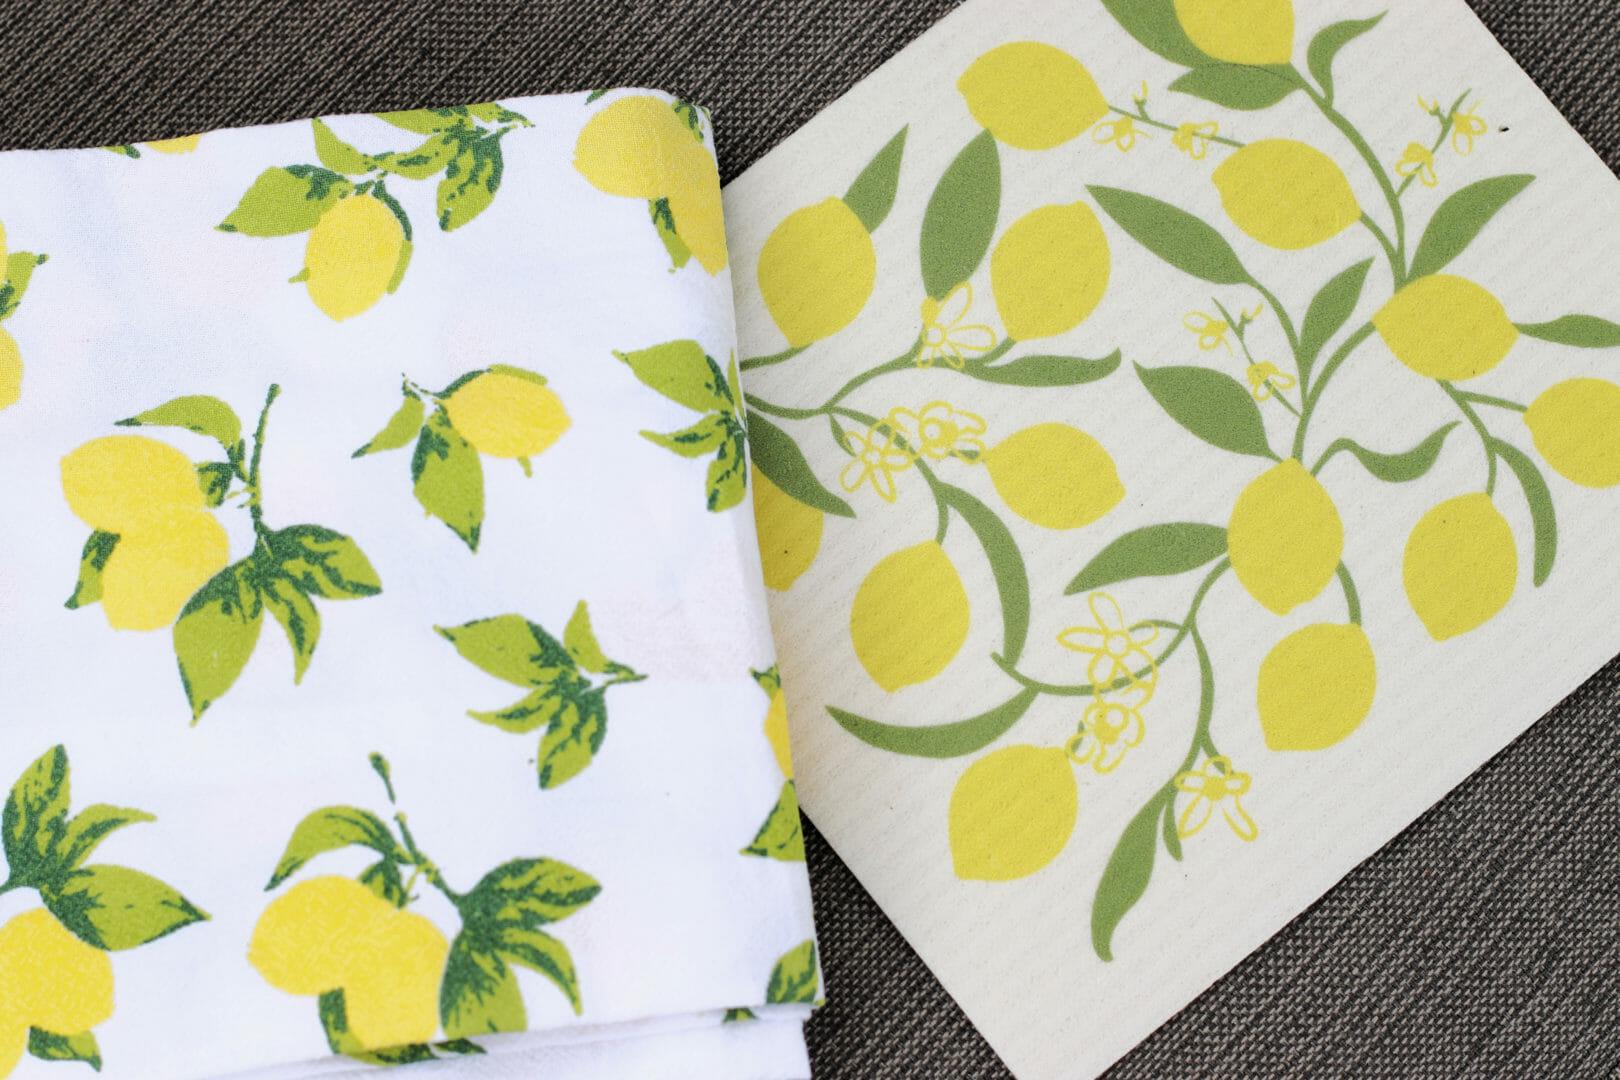 lemon towels